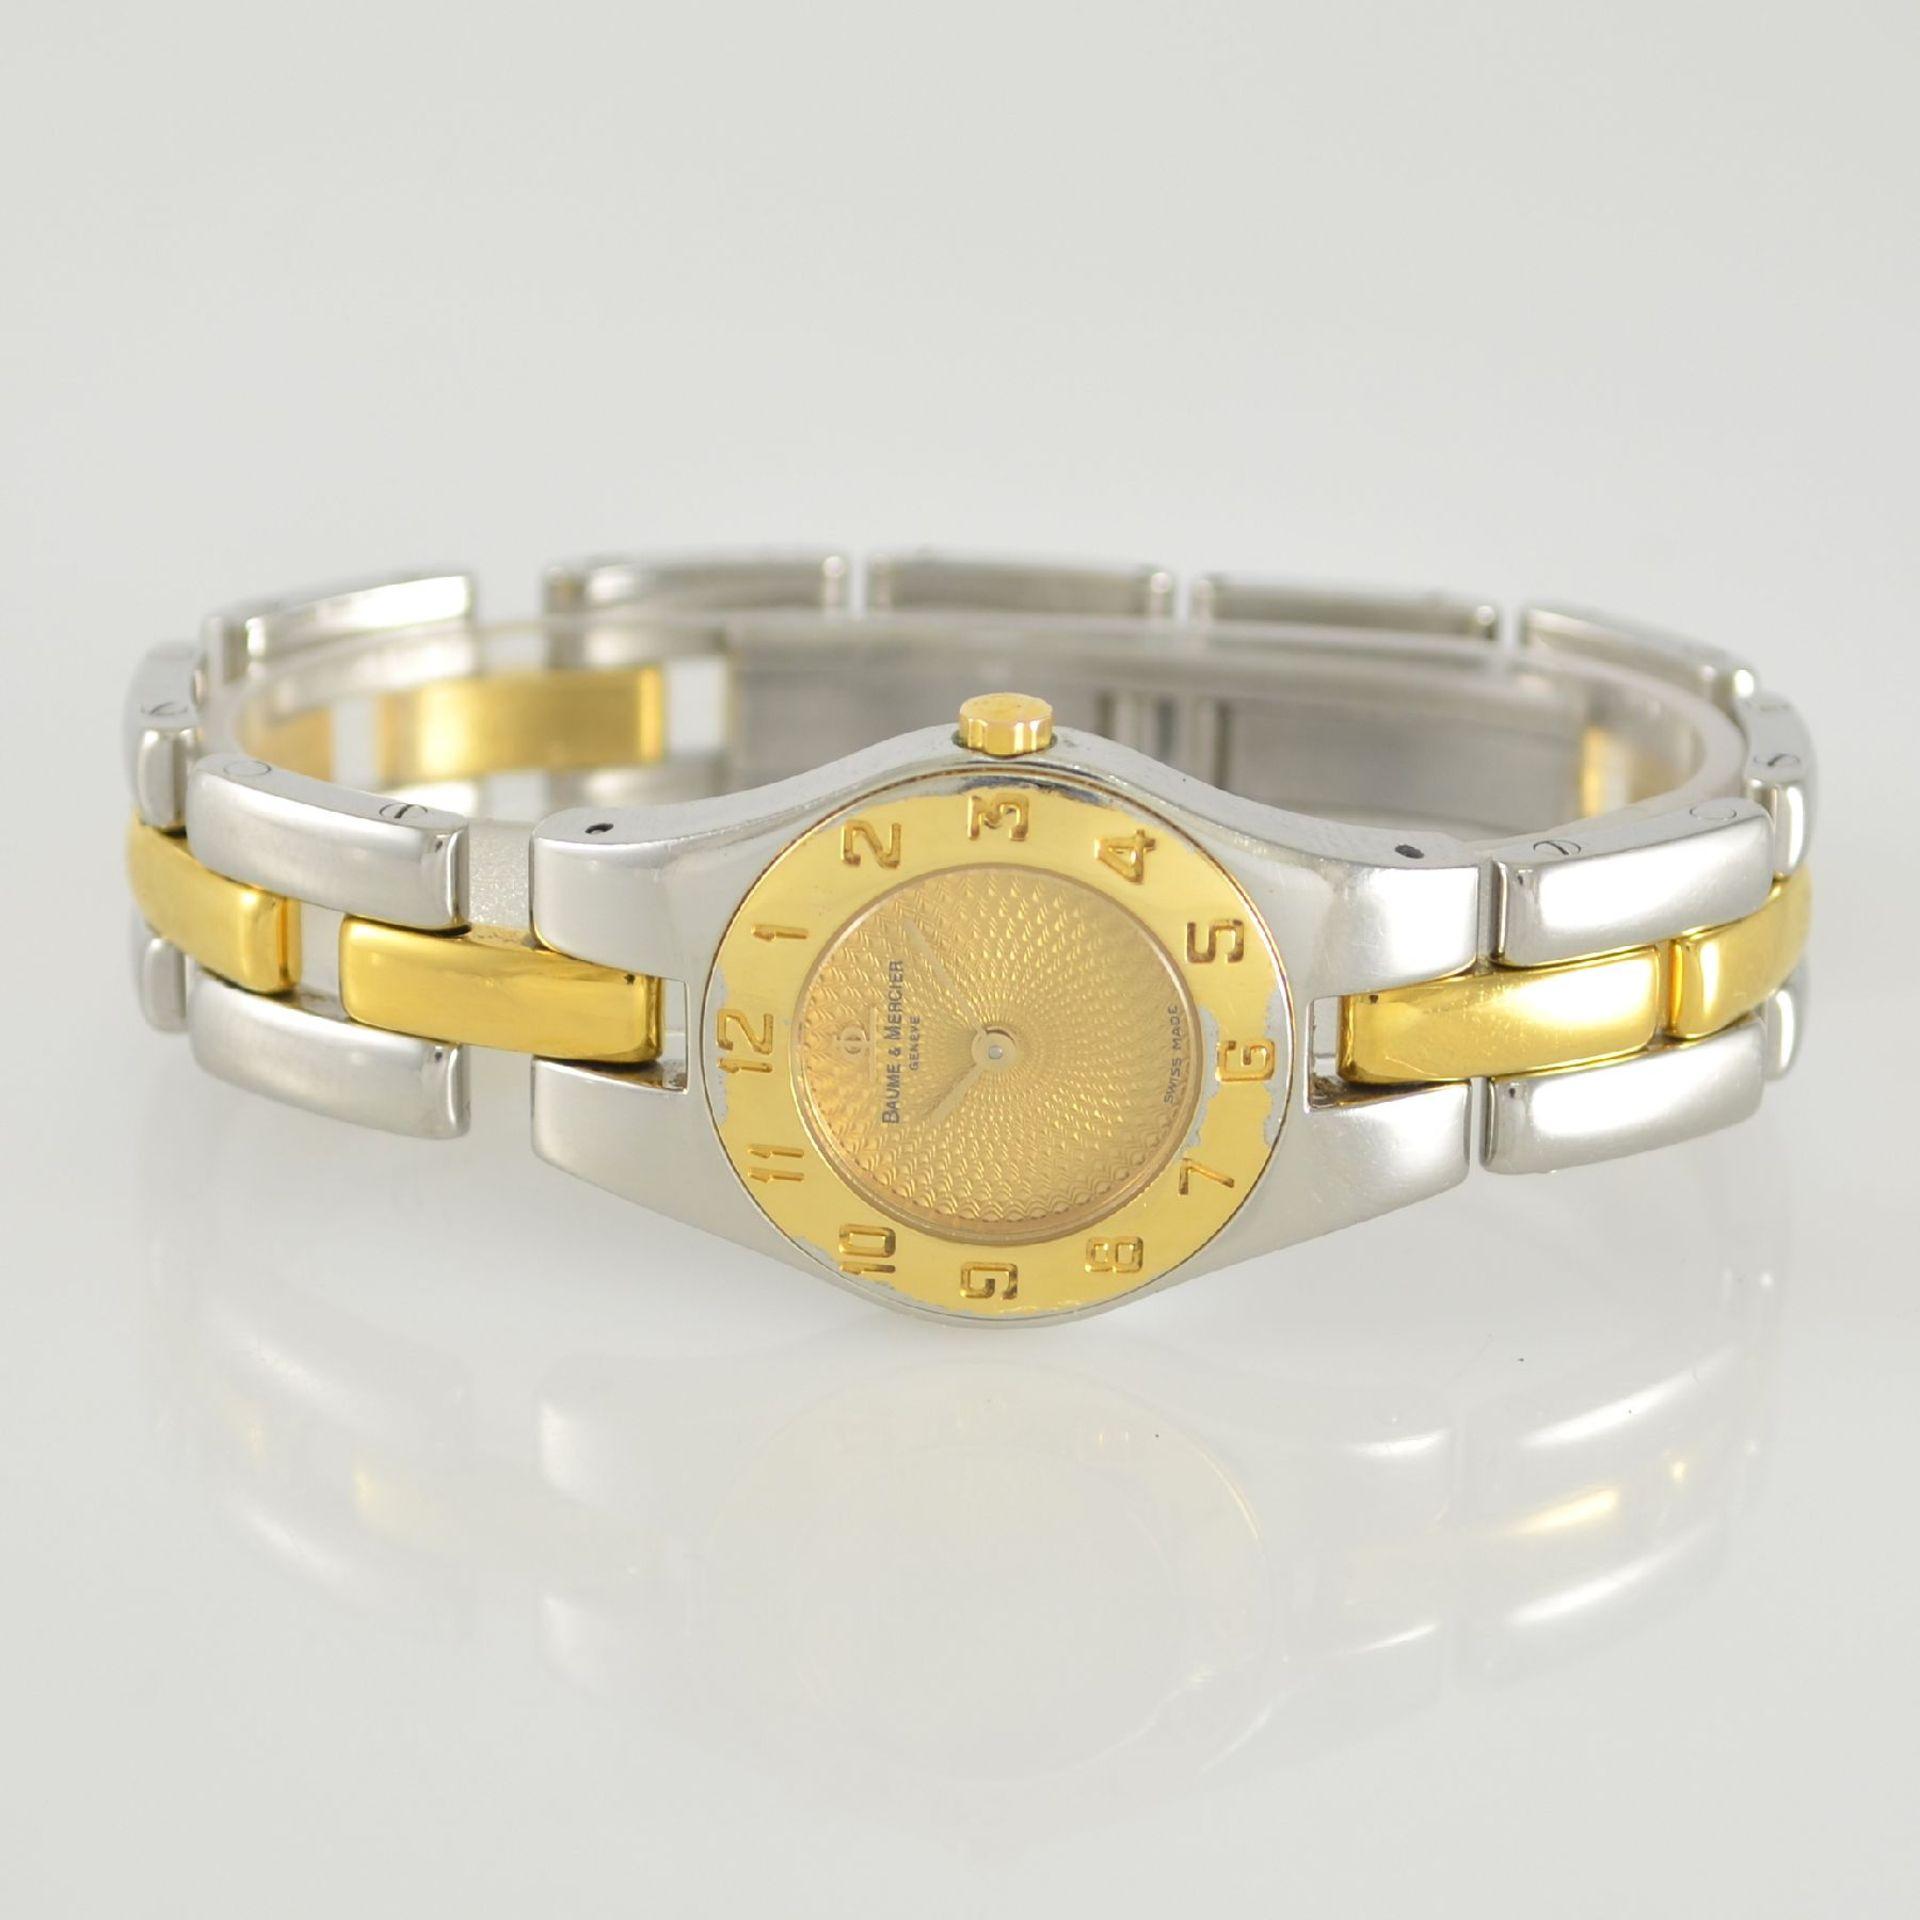 BAUME & MERCIER Damenarmbanduhr in Stahl/ vergoldet, Schweiz um 2000, gedr. Geh. m. integr.